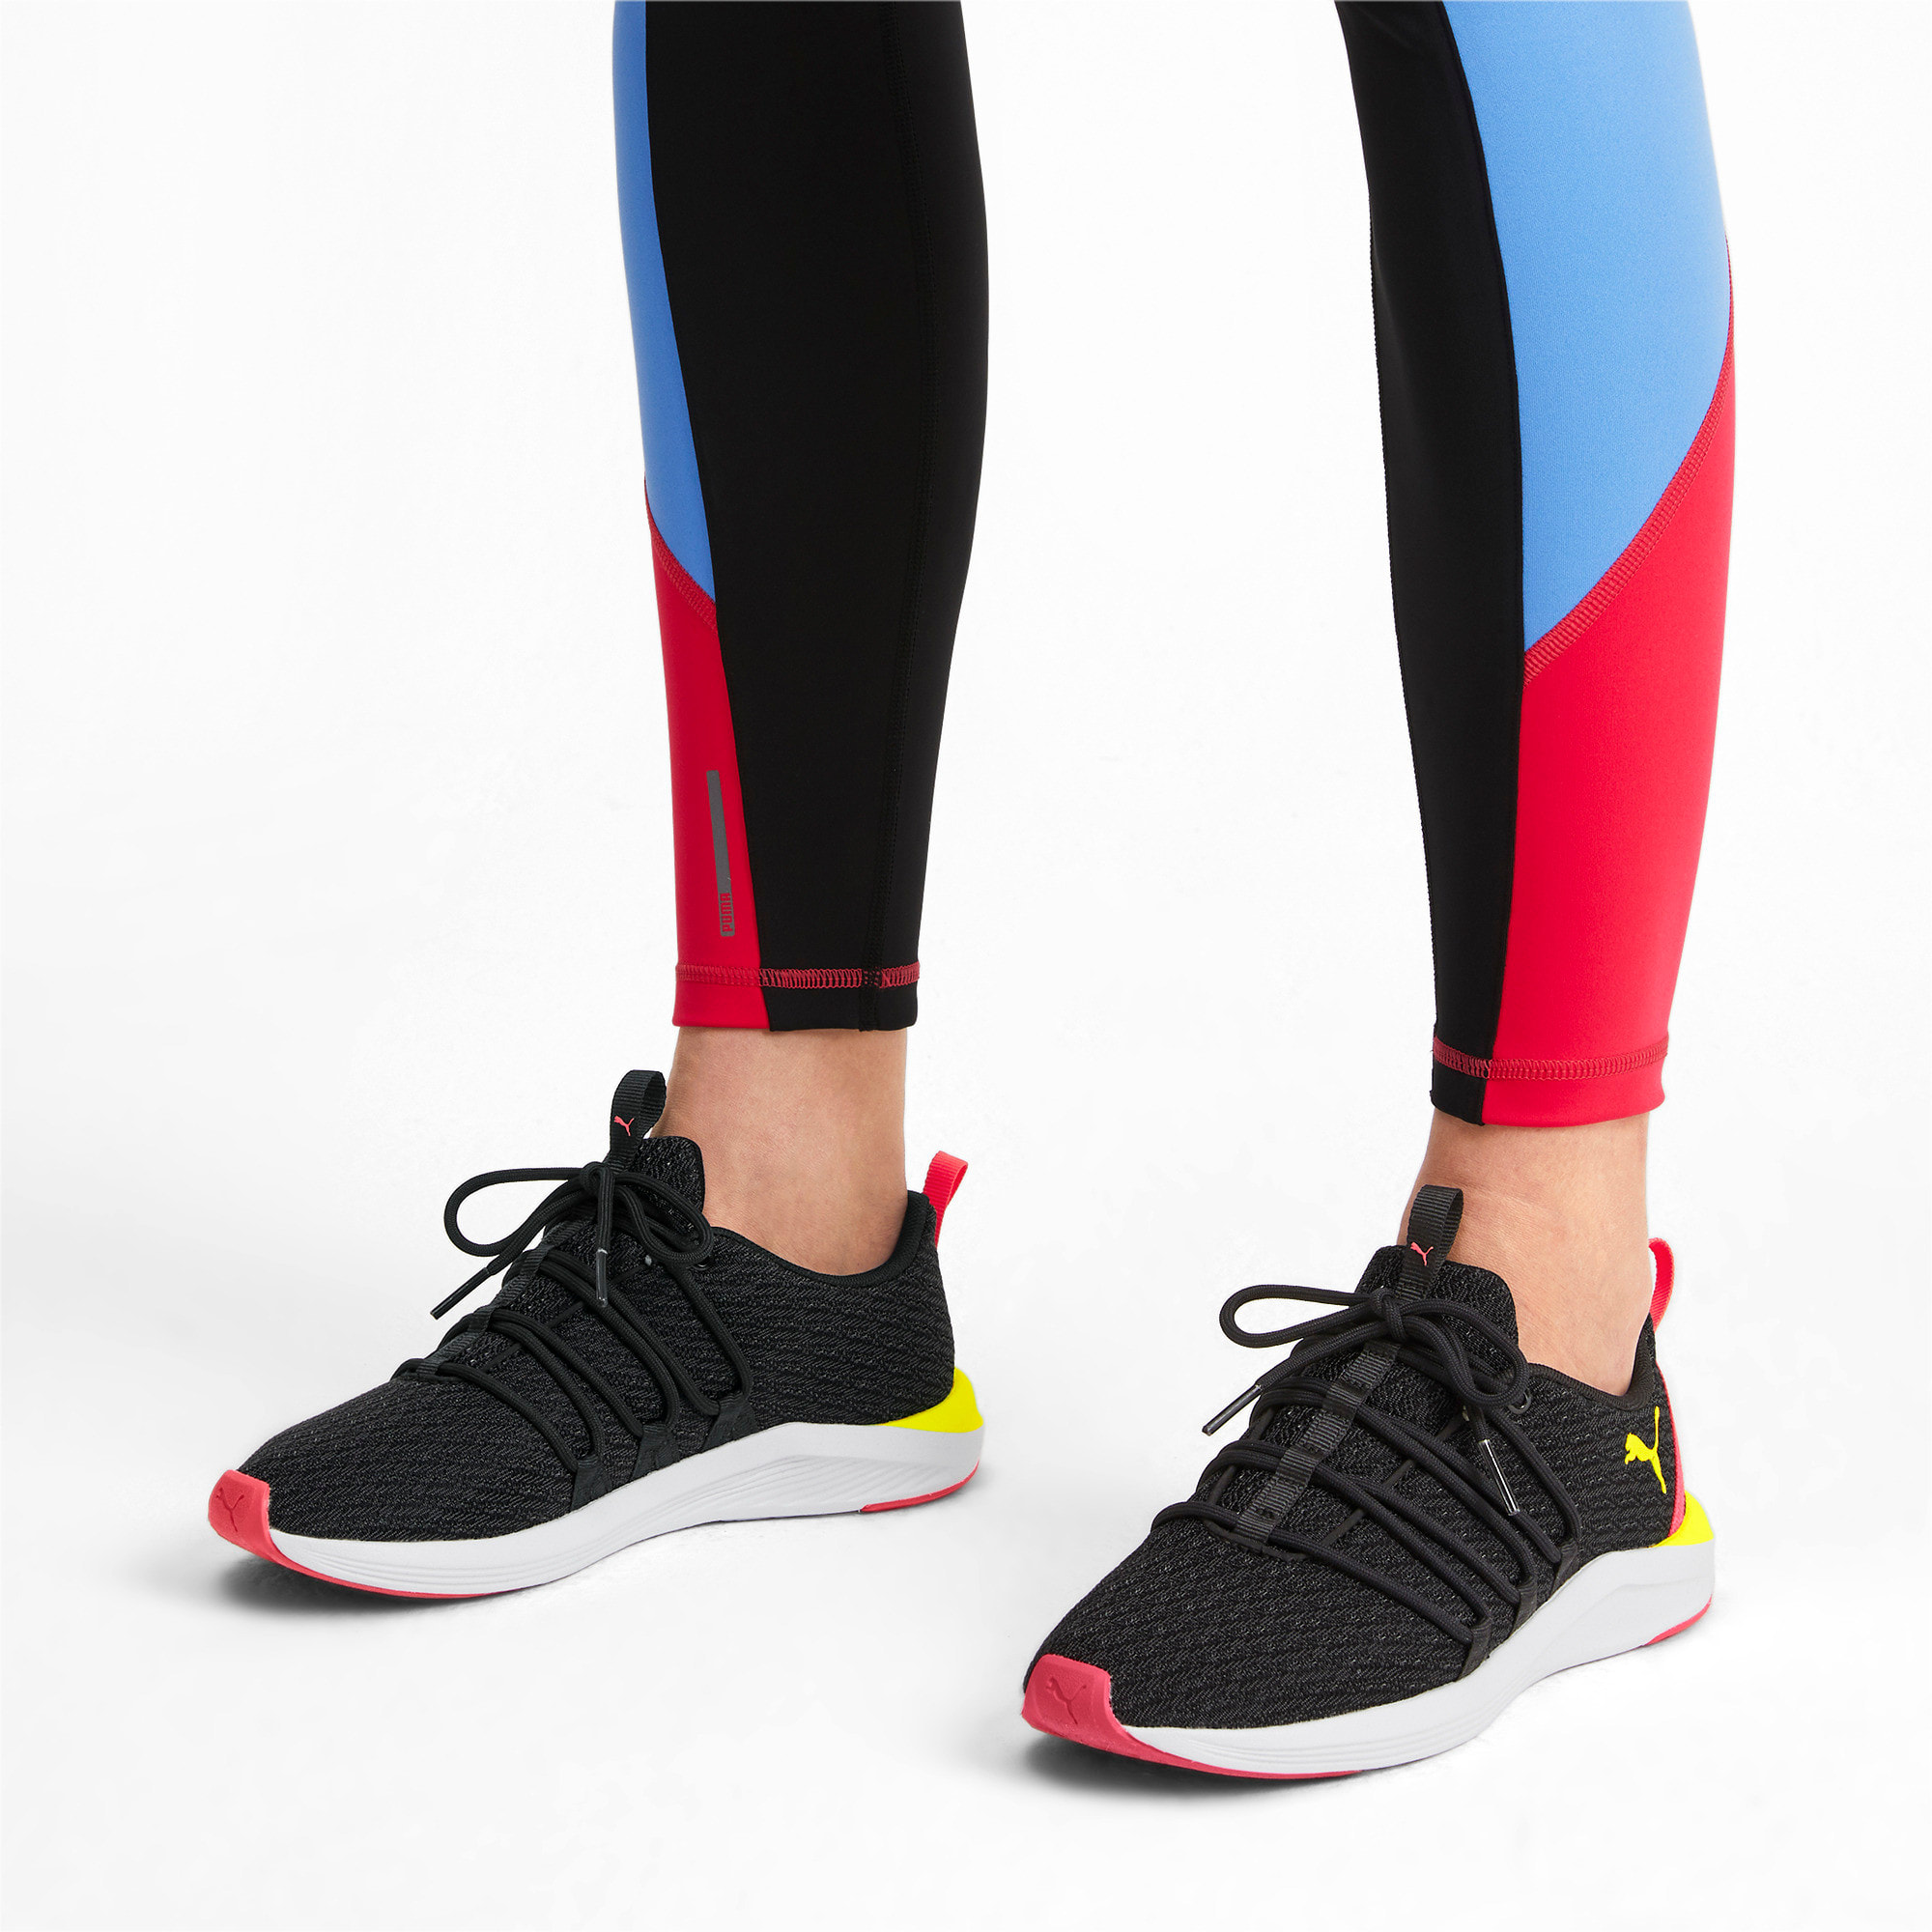 Imagen en miniatura 2 de Zapatillas de mujer Prowl Alt Neon, Puma Black-Yellow Alert, mediana